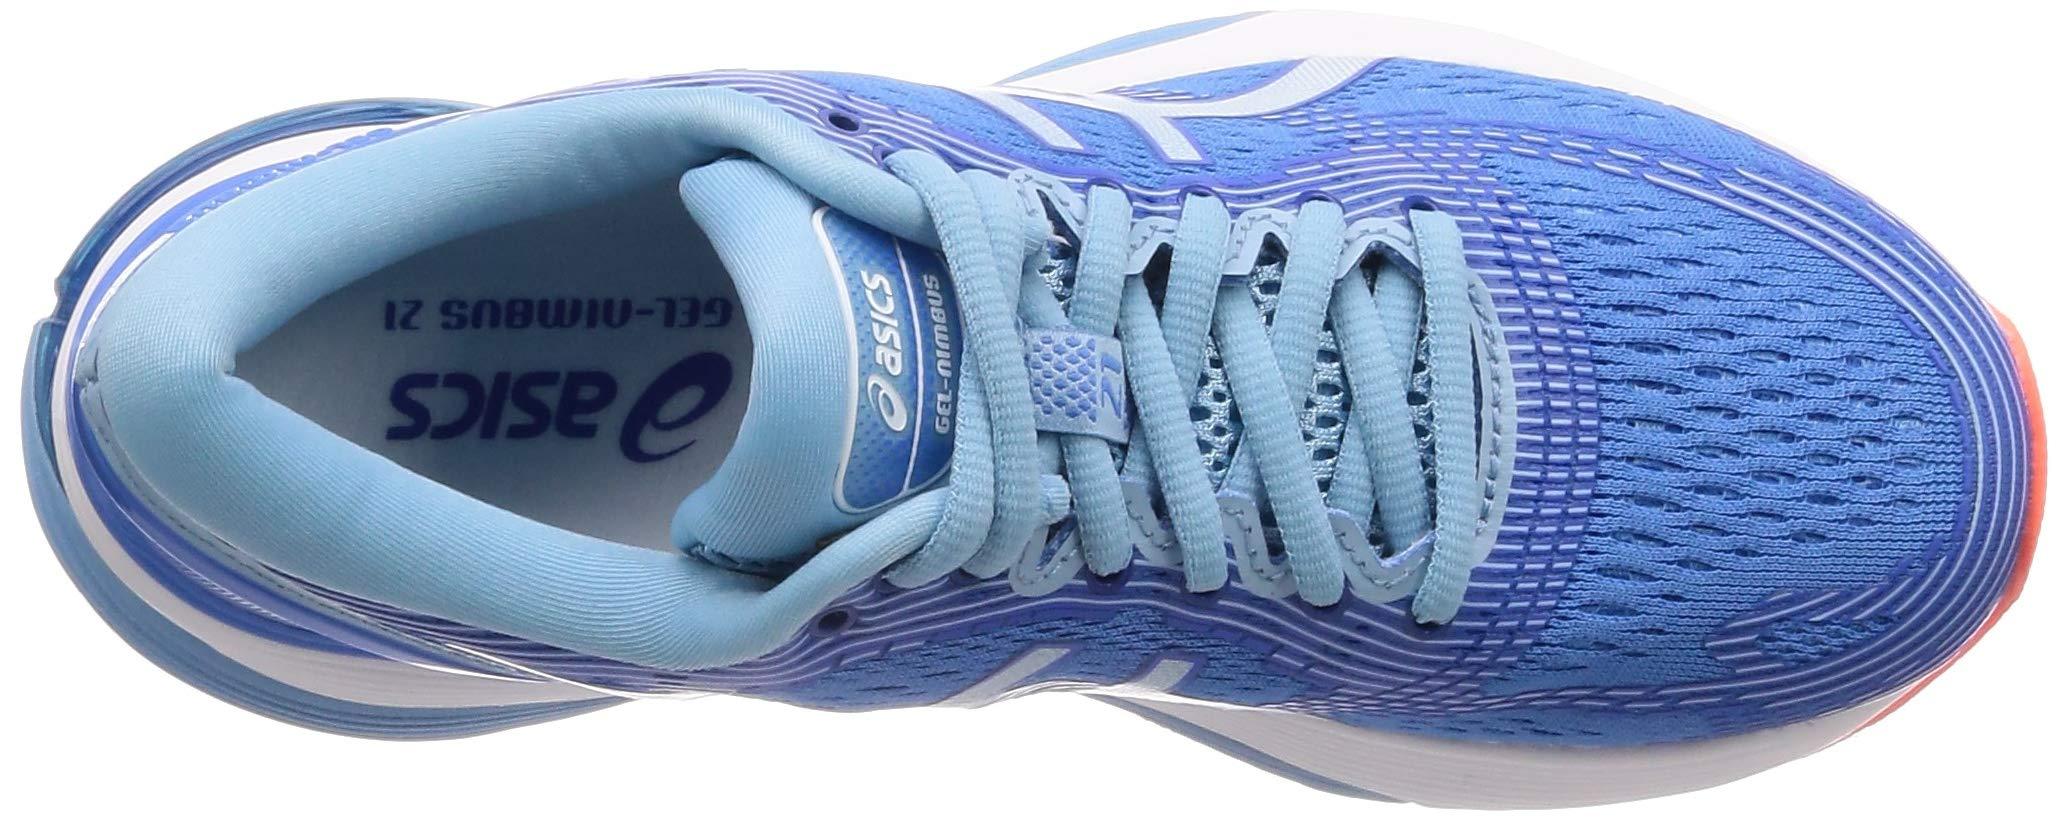 71IsuJVyExL - ASICS Women's Gel-Nimbus 21 Running Shoes